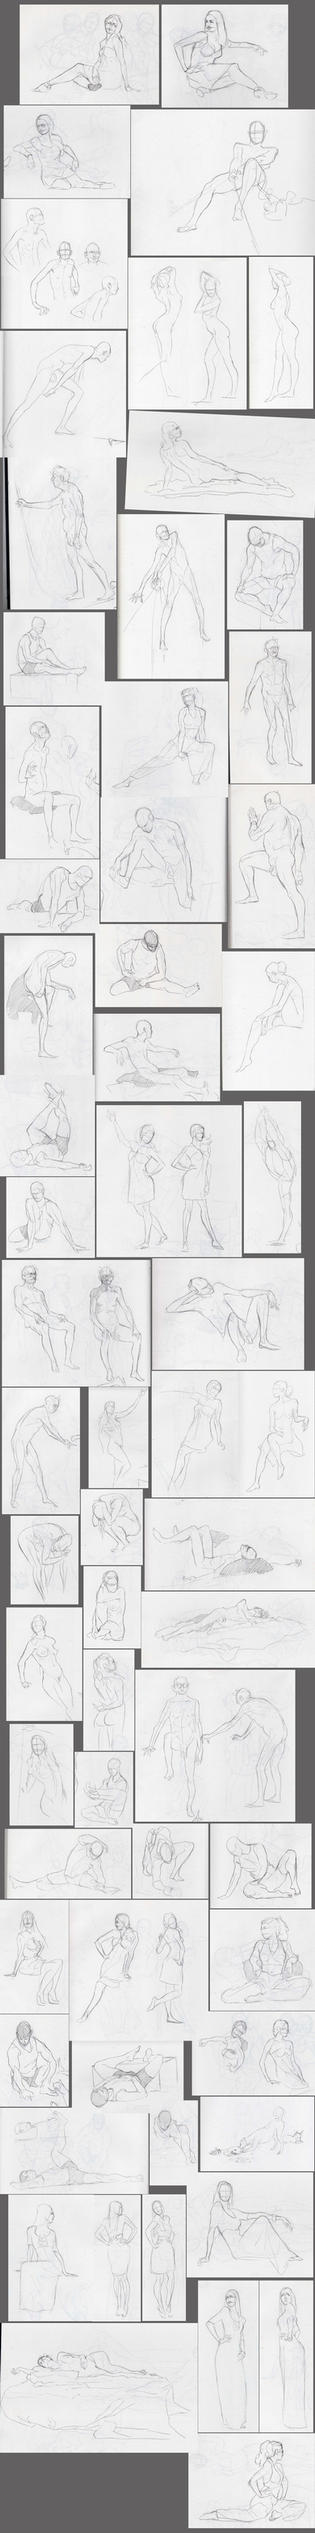 -Life Drawing Part II- by JoeDillon